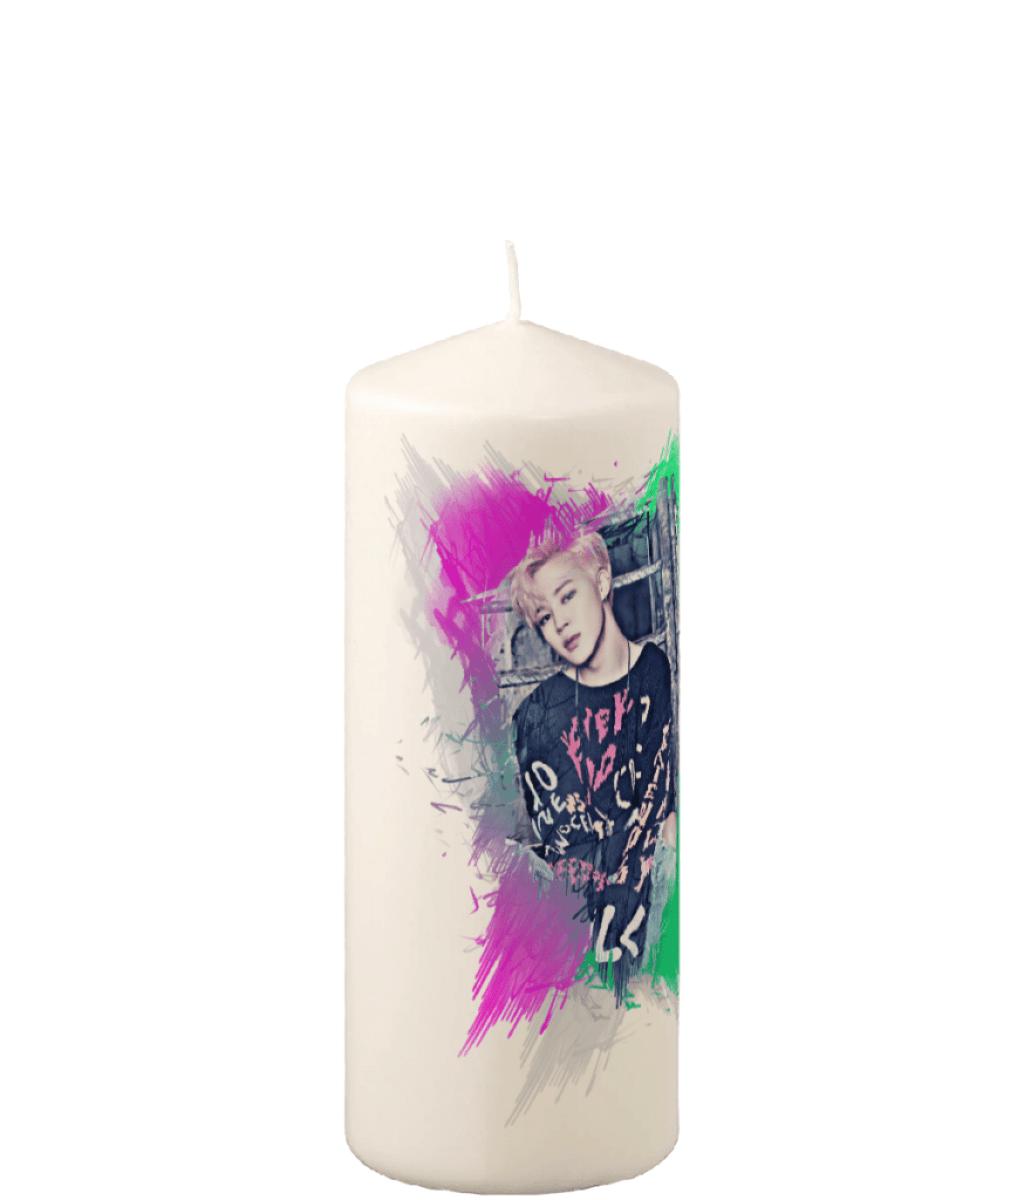 BTS Jimin Picture Pillar Candle